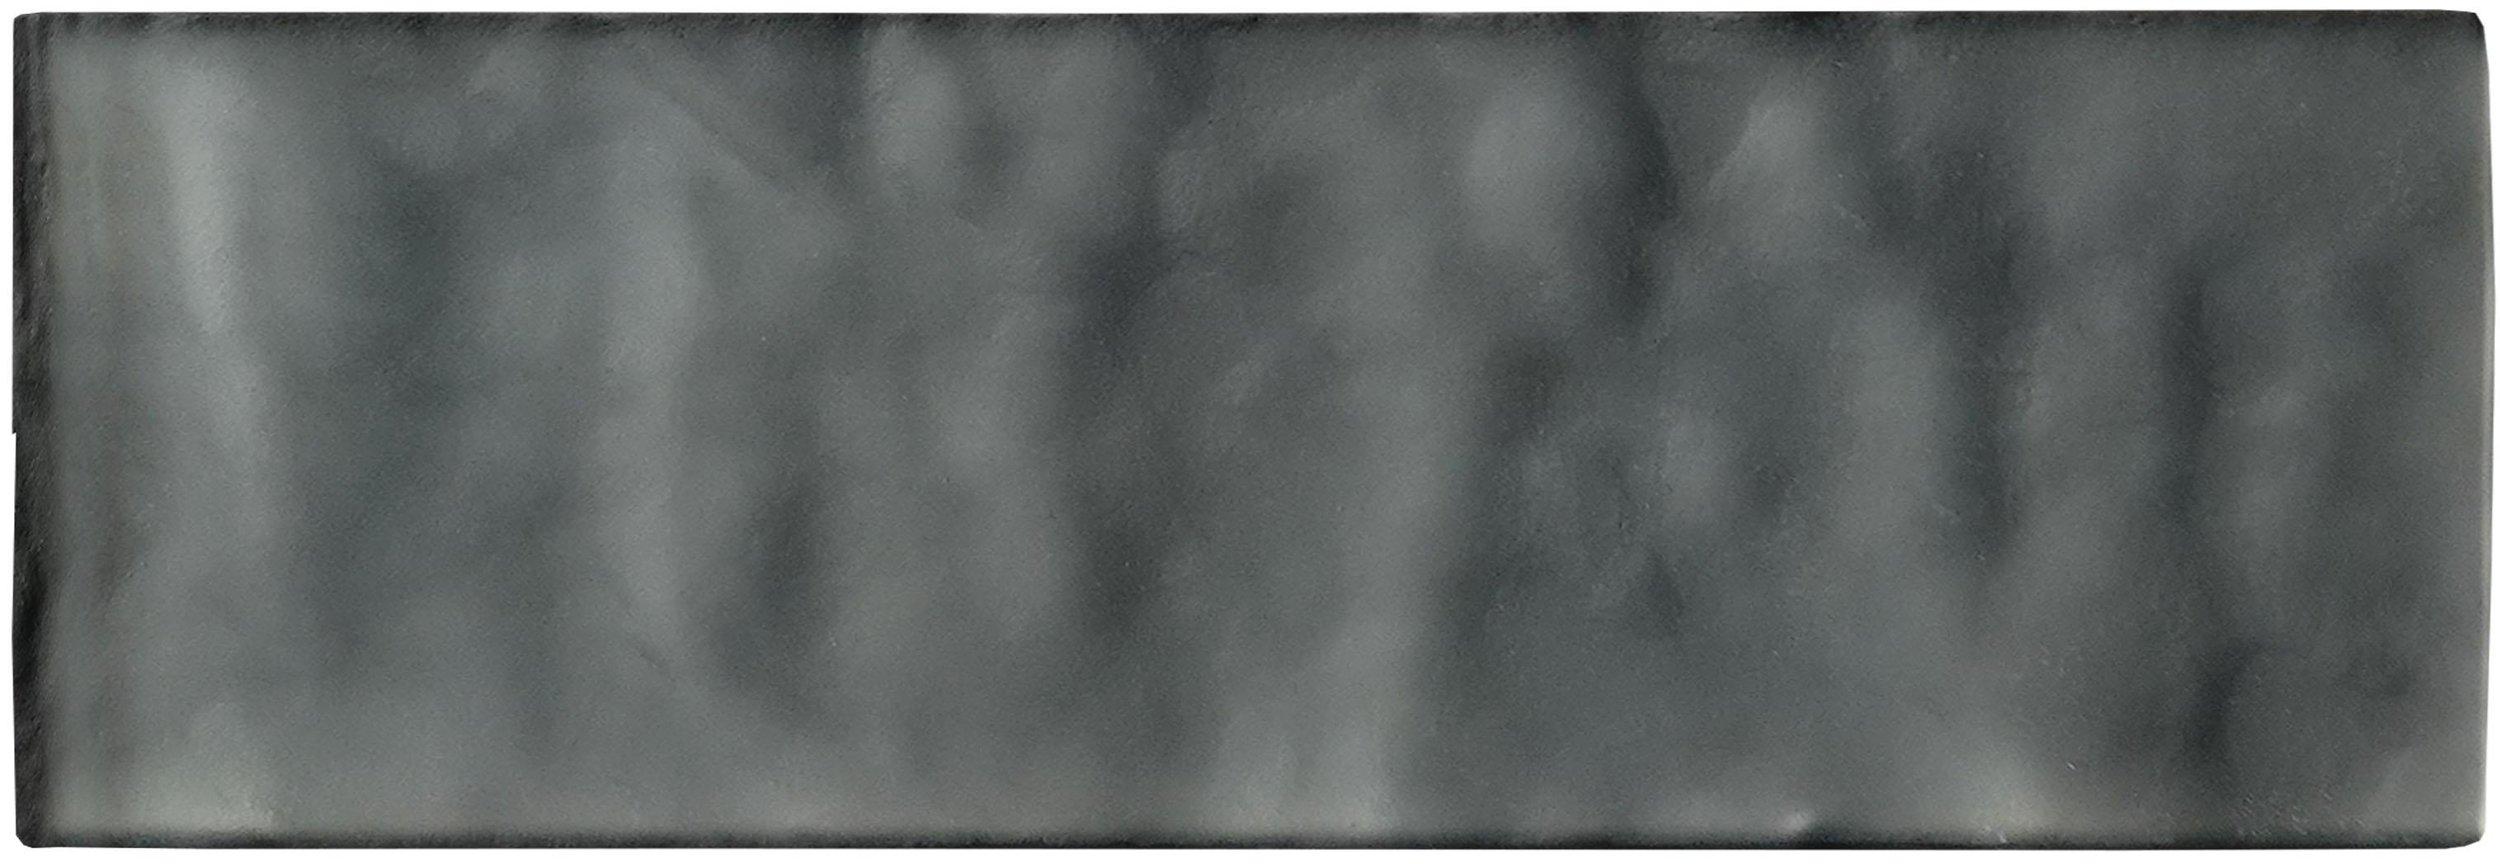 f135367c-e2a8-4c7d-bac7-41080ca3c7cc.jpg